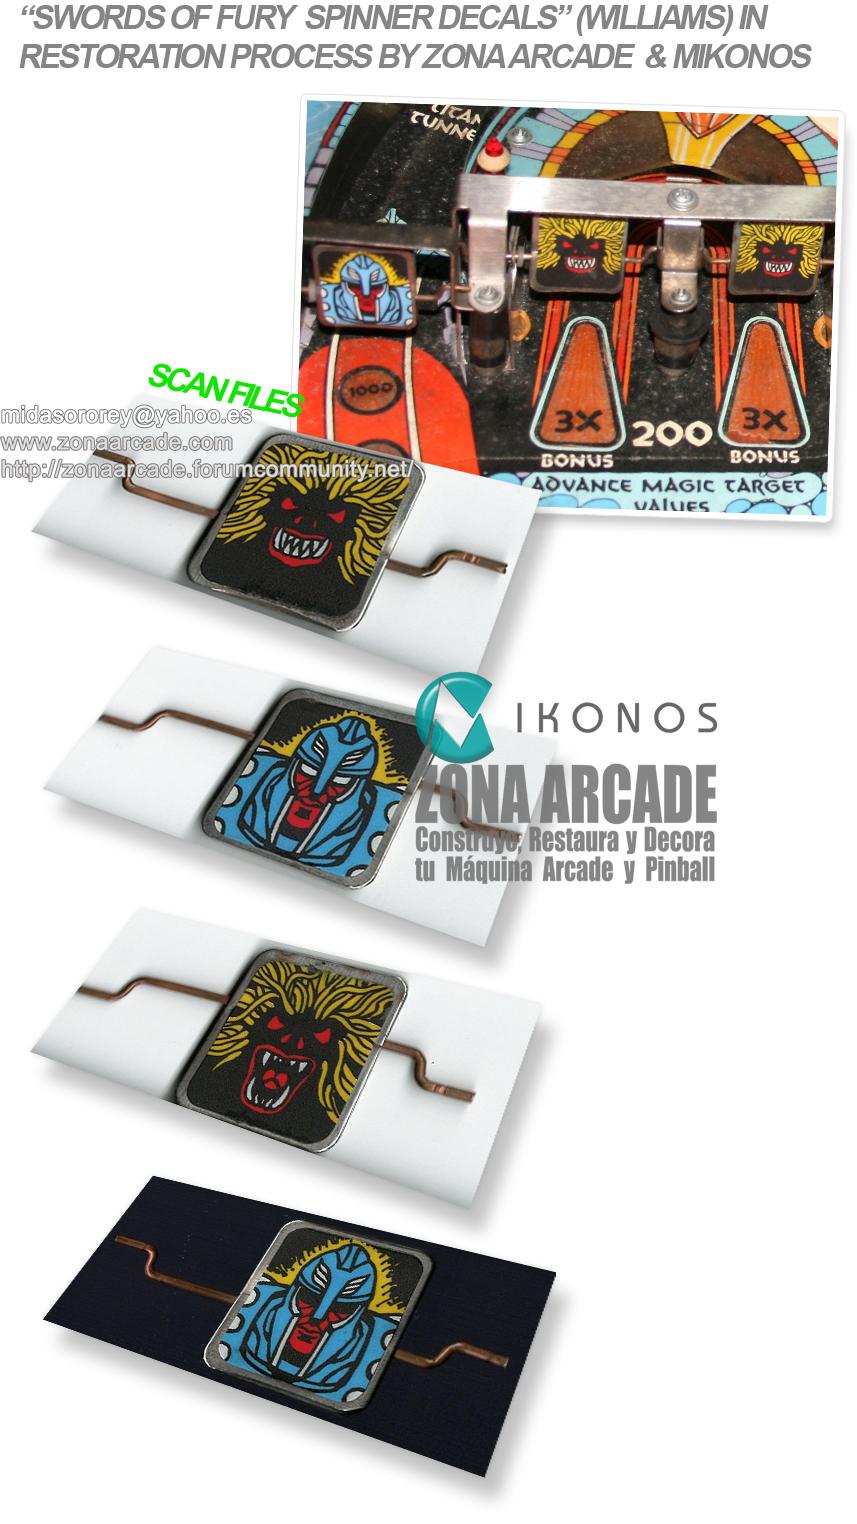 Swords-Of-Fury-Spinner-Pinball-Decals-In-Restoration-Mikonos2.jpg